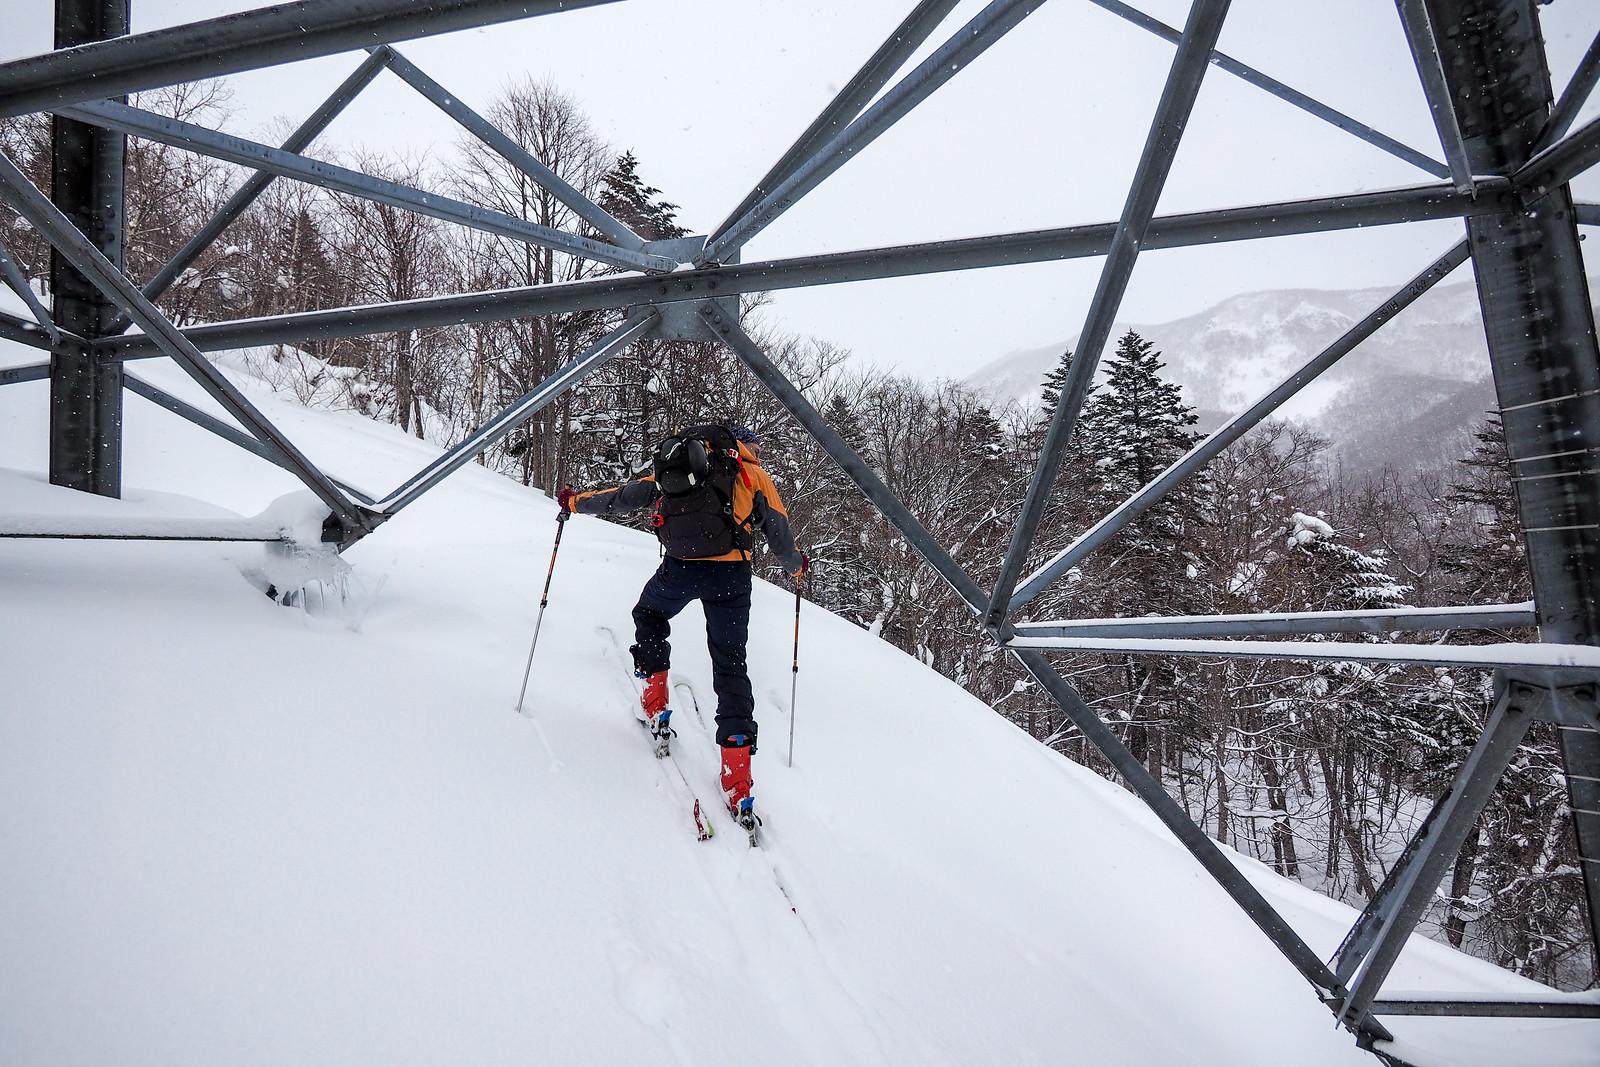 Mt. Mayoizawa ski touring (Sapporo City, Hokkaido, Japan)